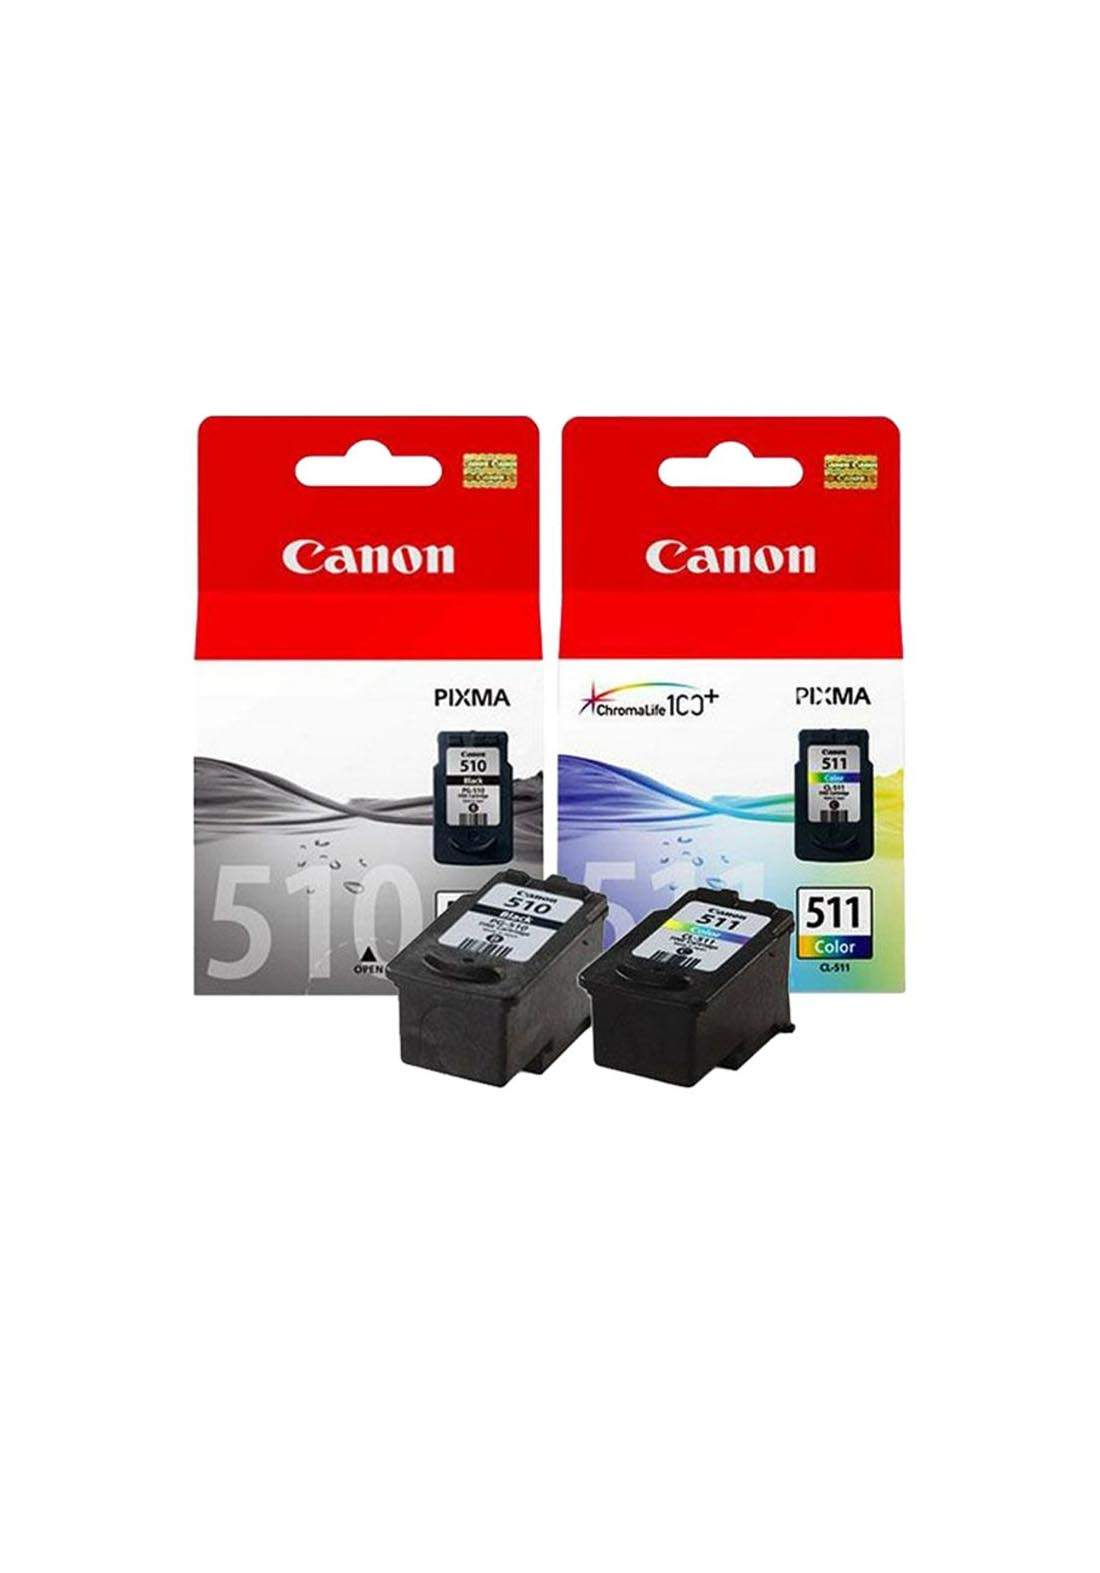 Canon PG510/ CL511 Ink Cartridges - Black خرطوشة حبر